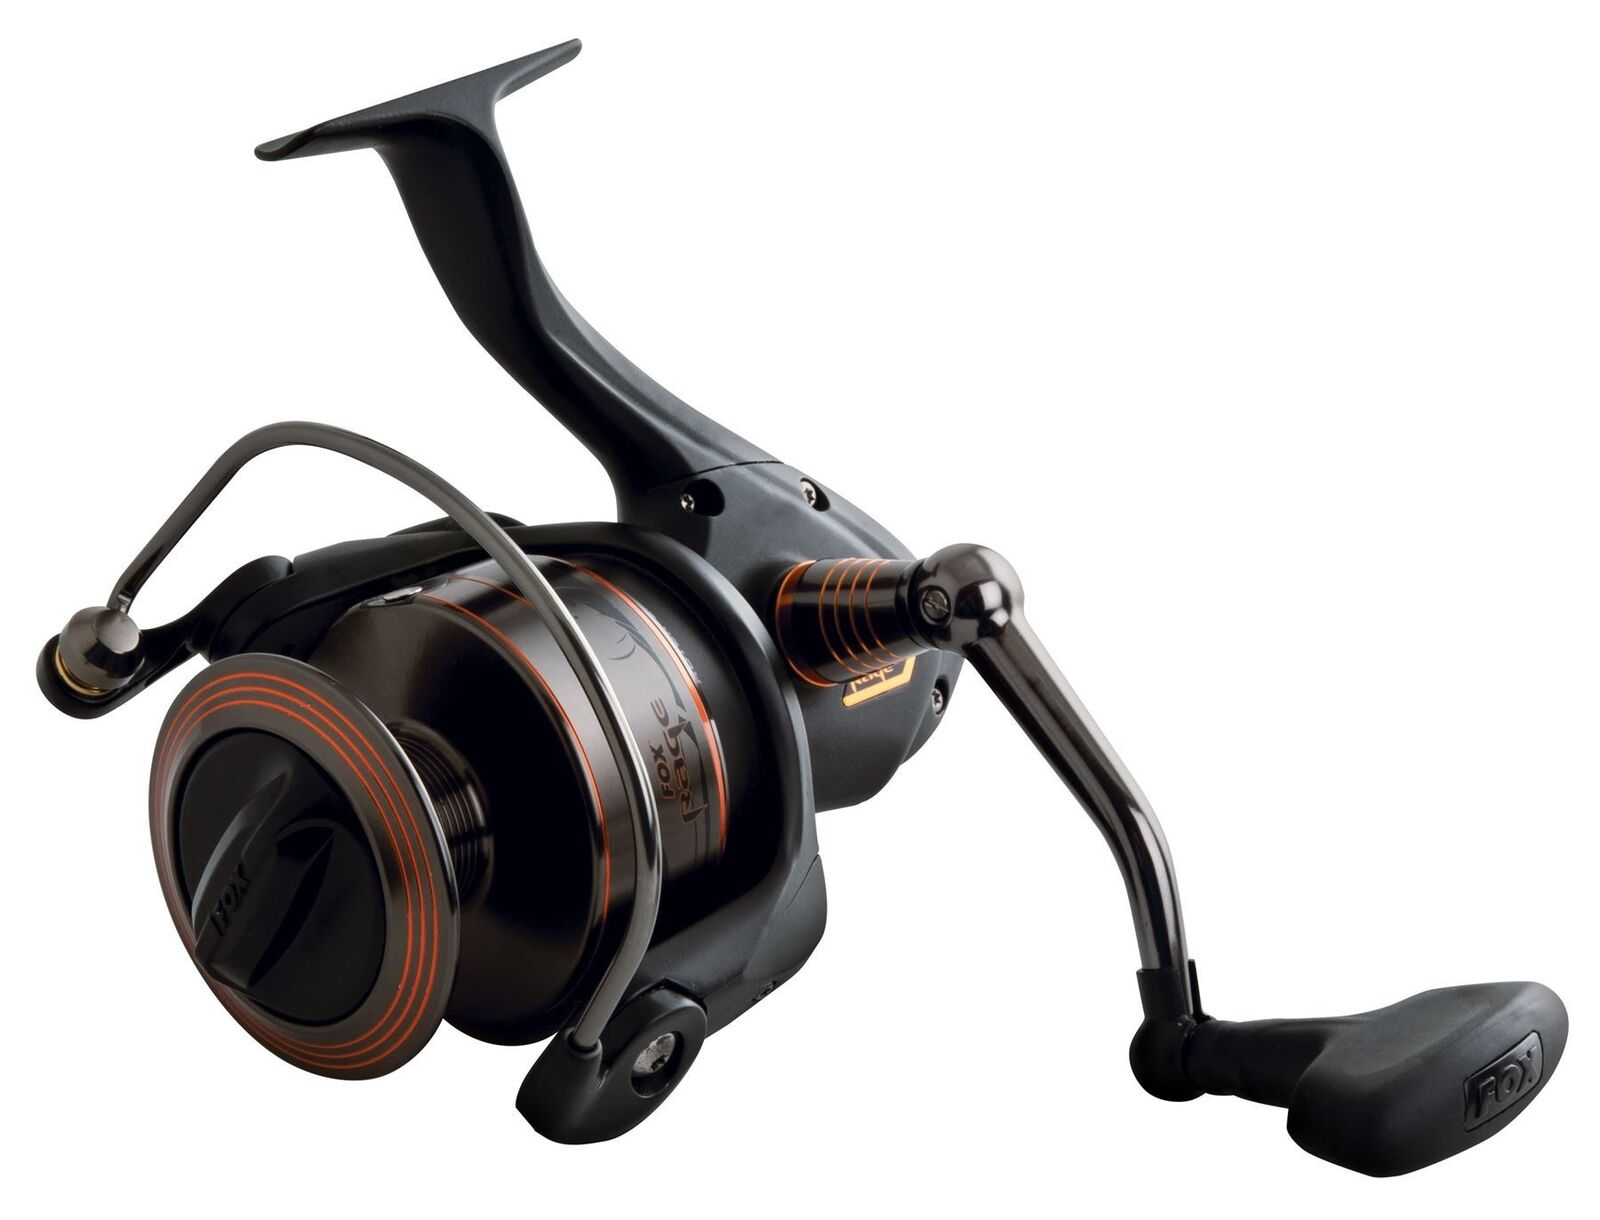 Fox Rage CR800 Reel Catfish Reel CR800 3e96c7